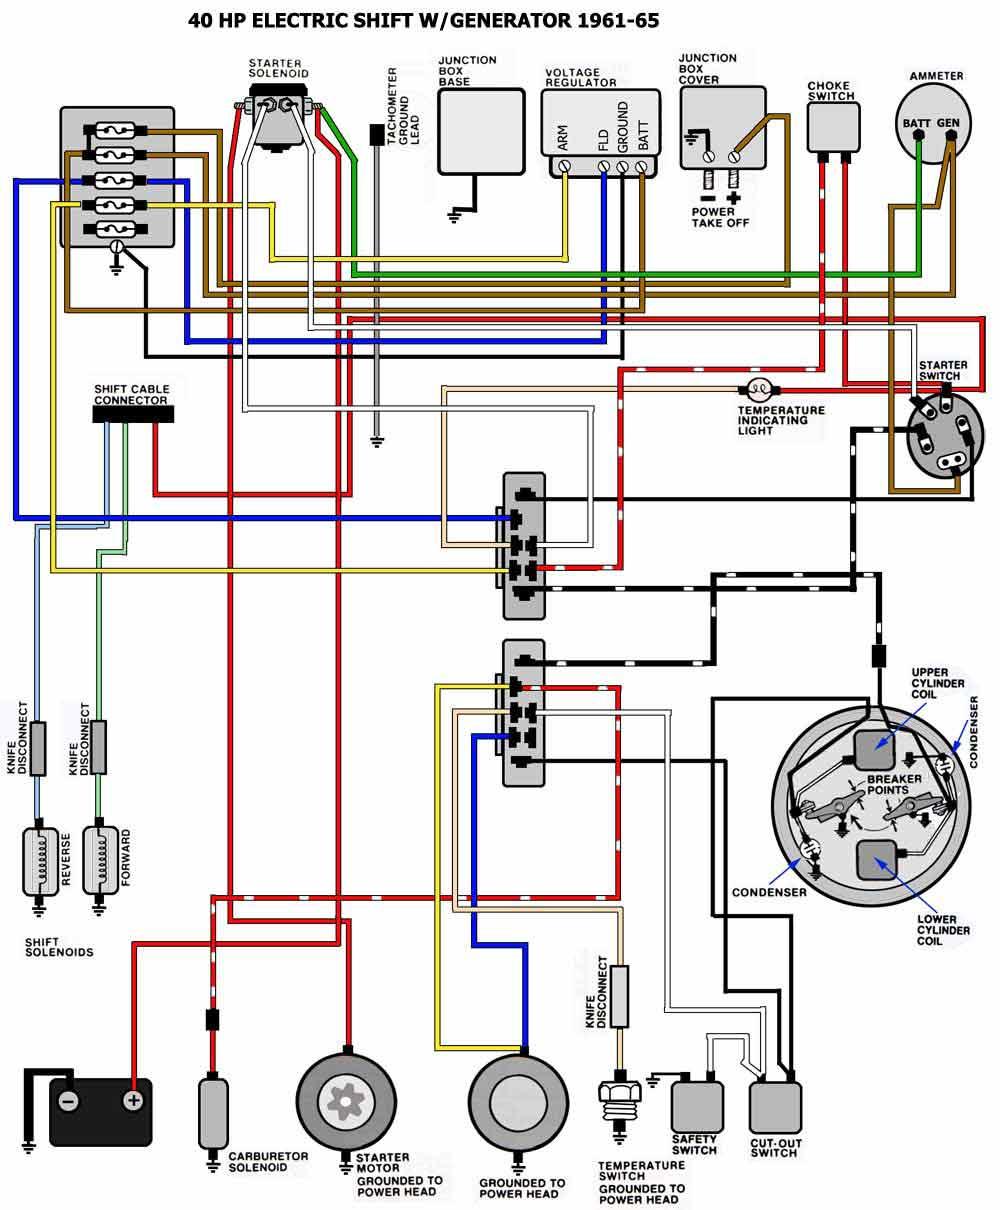 Lovely Harbor Freight Predator Engine Wiring Diagram Images ...